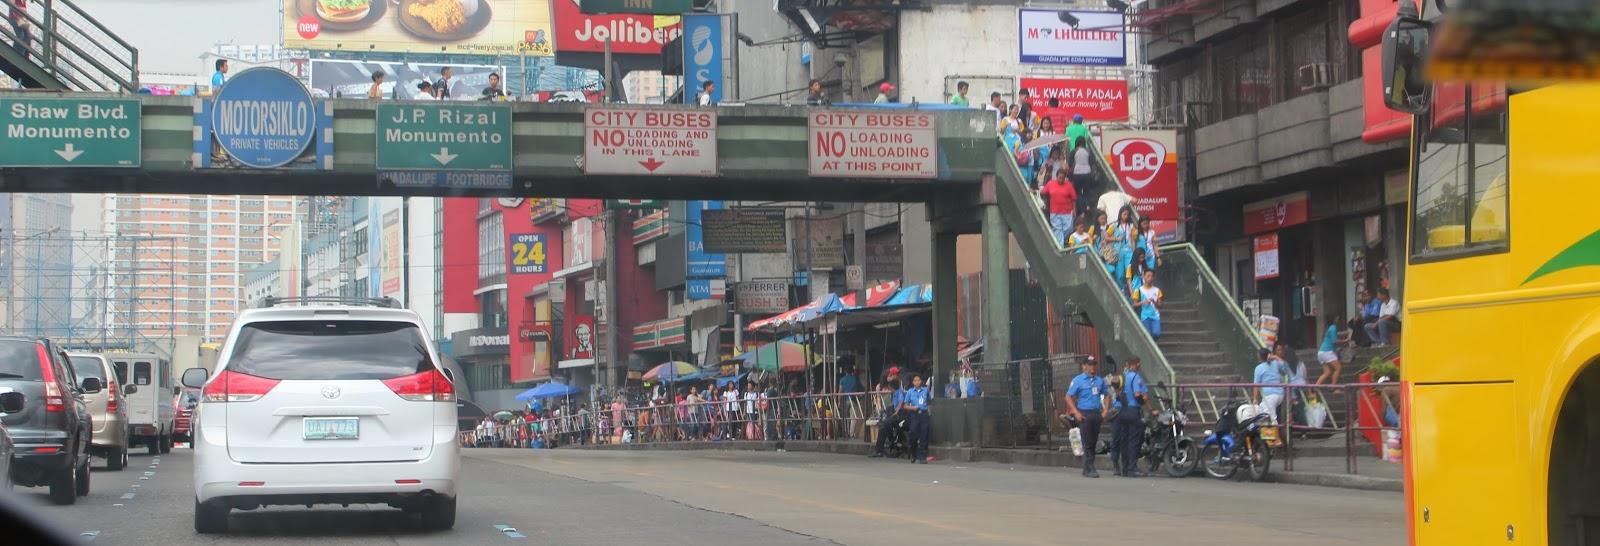 Manila street #philippine #manila #urban #street #life